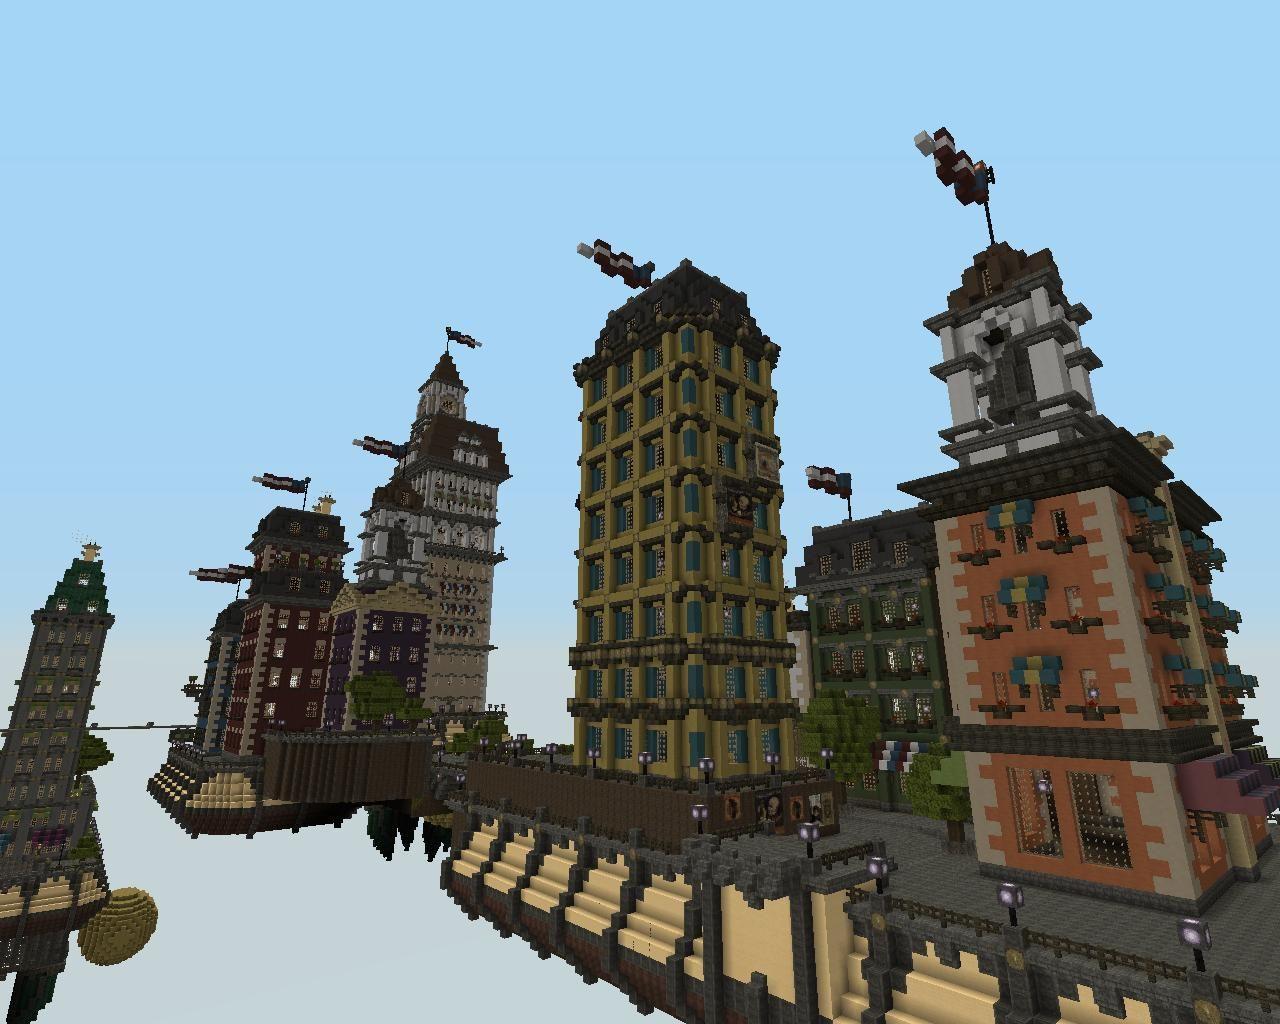 http://cdn.destructoid.com//ul/251246-bioshock-infinite-s-columbia-recreated-in-minecraft/MinecraftInfinite07-noscale.jpg